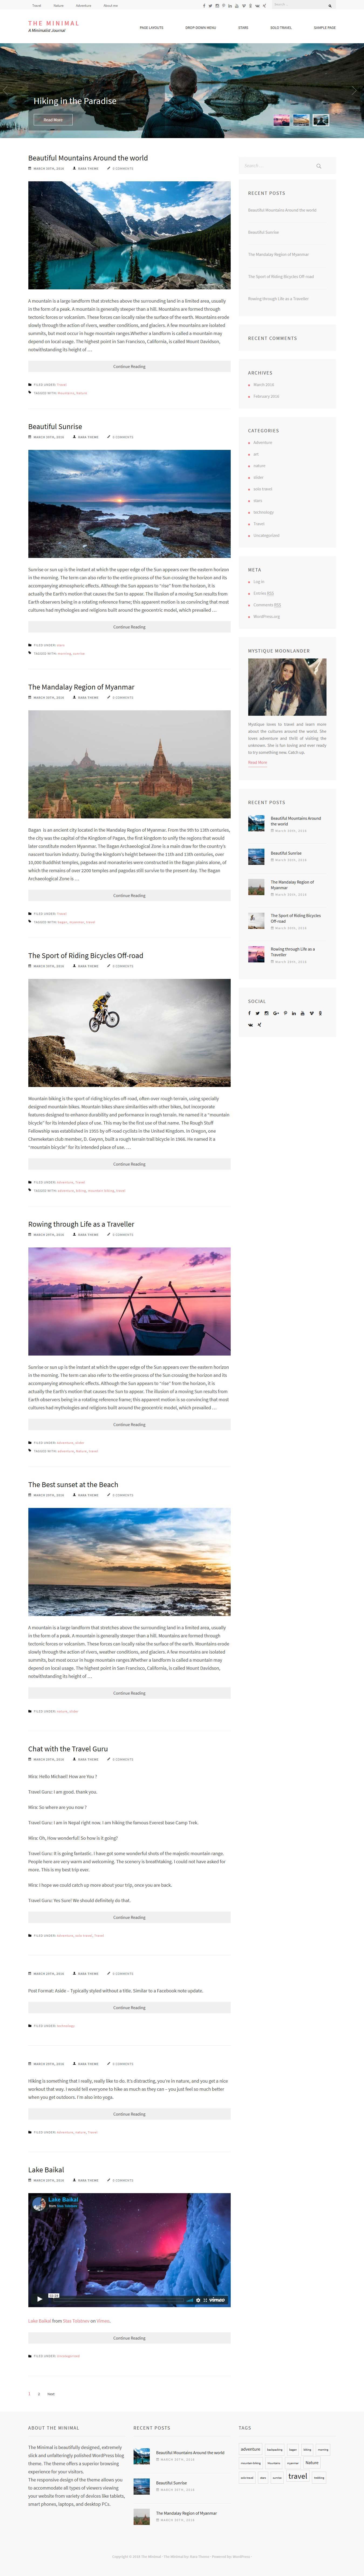 the minimal best free minimal wordpress theme - 10+ Best Free Minimal WordPress Themes